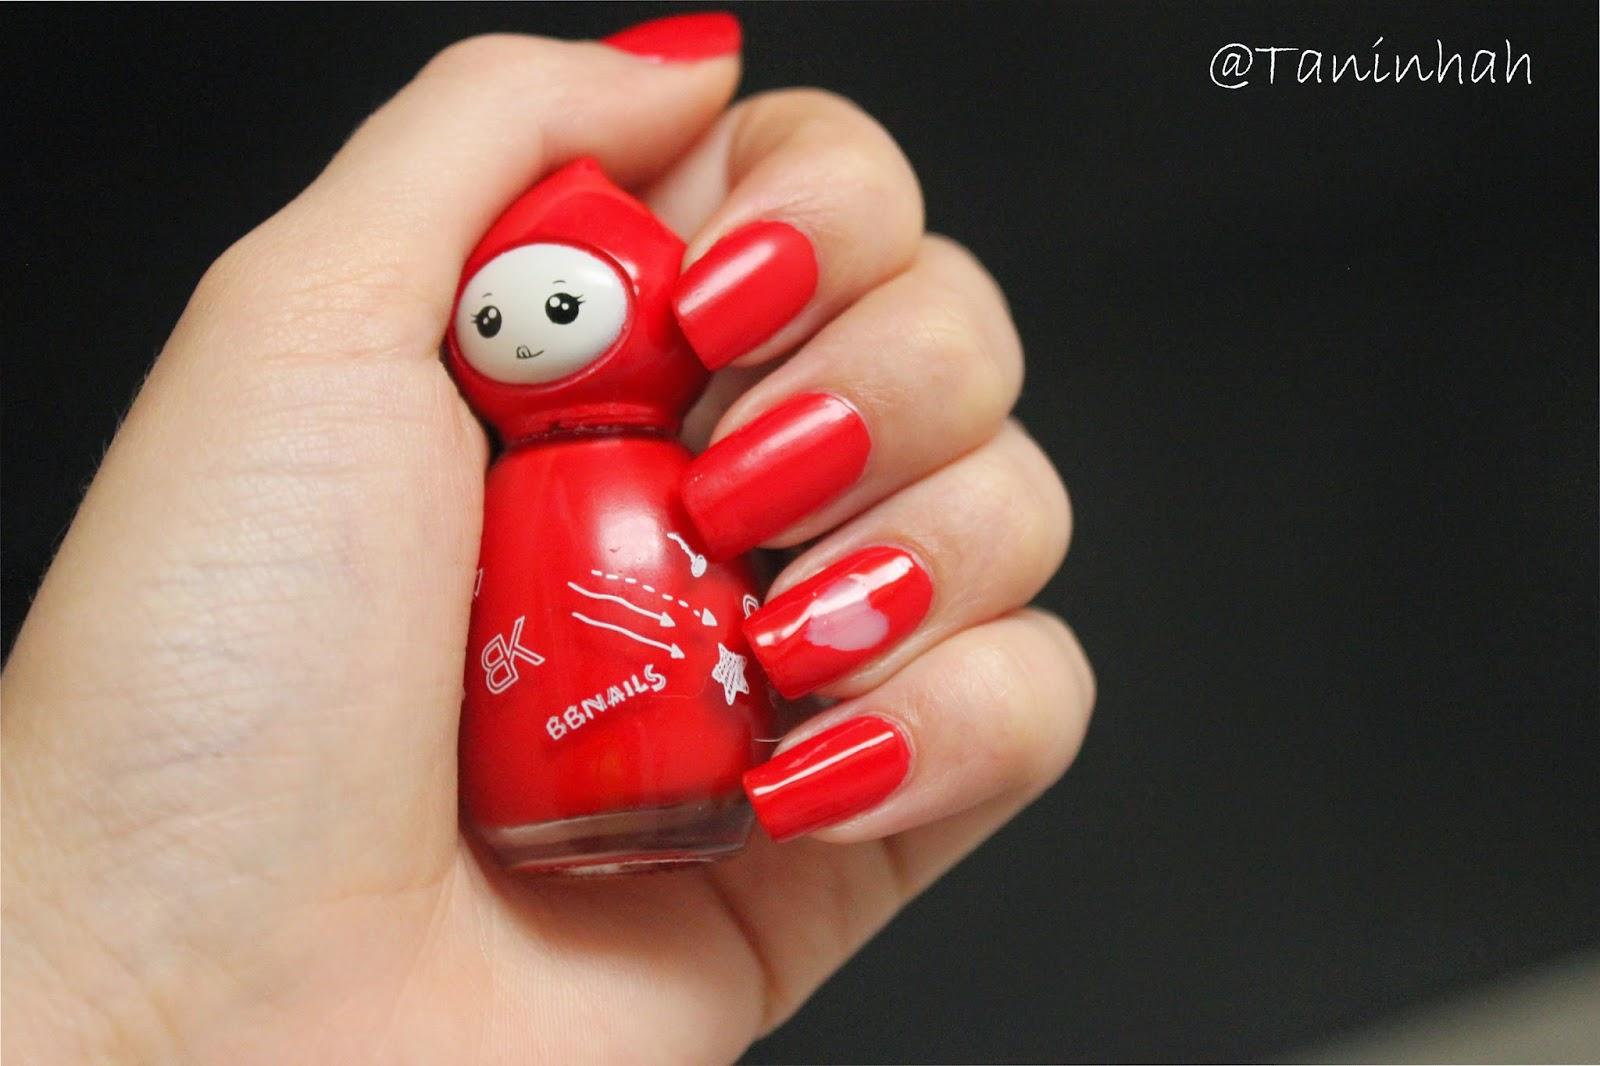 nail-polish-red-bbnails-taninhah